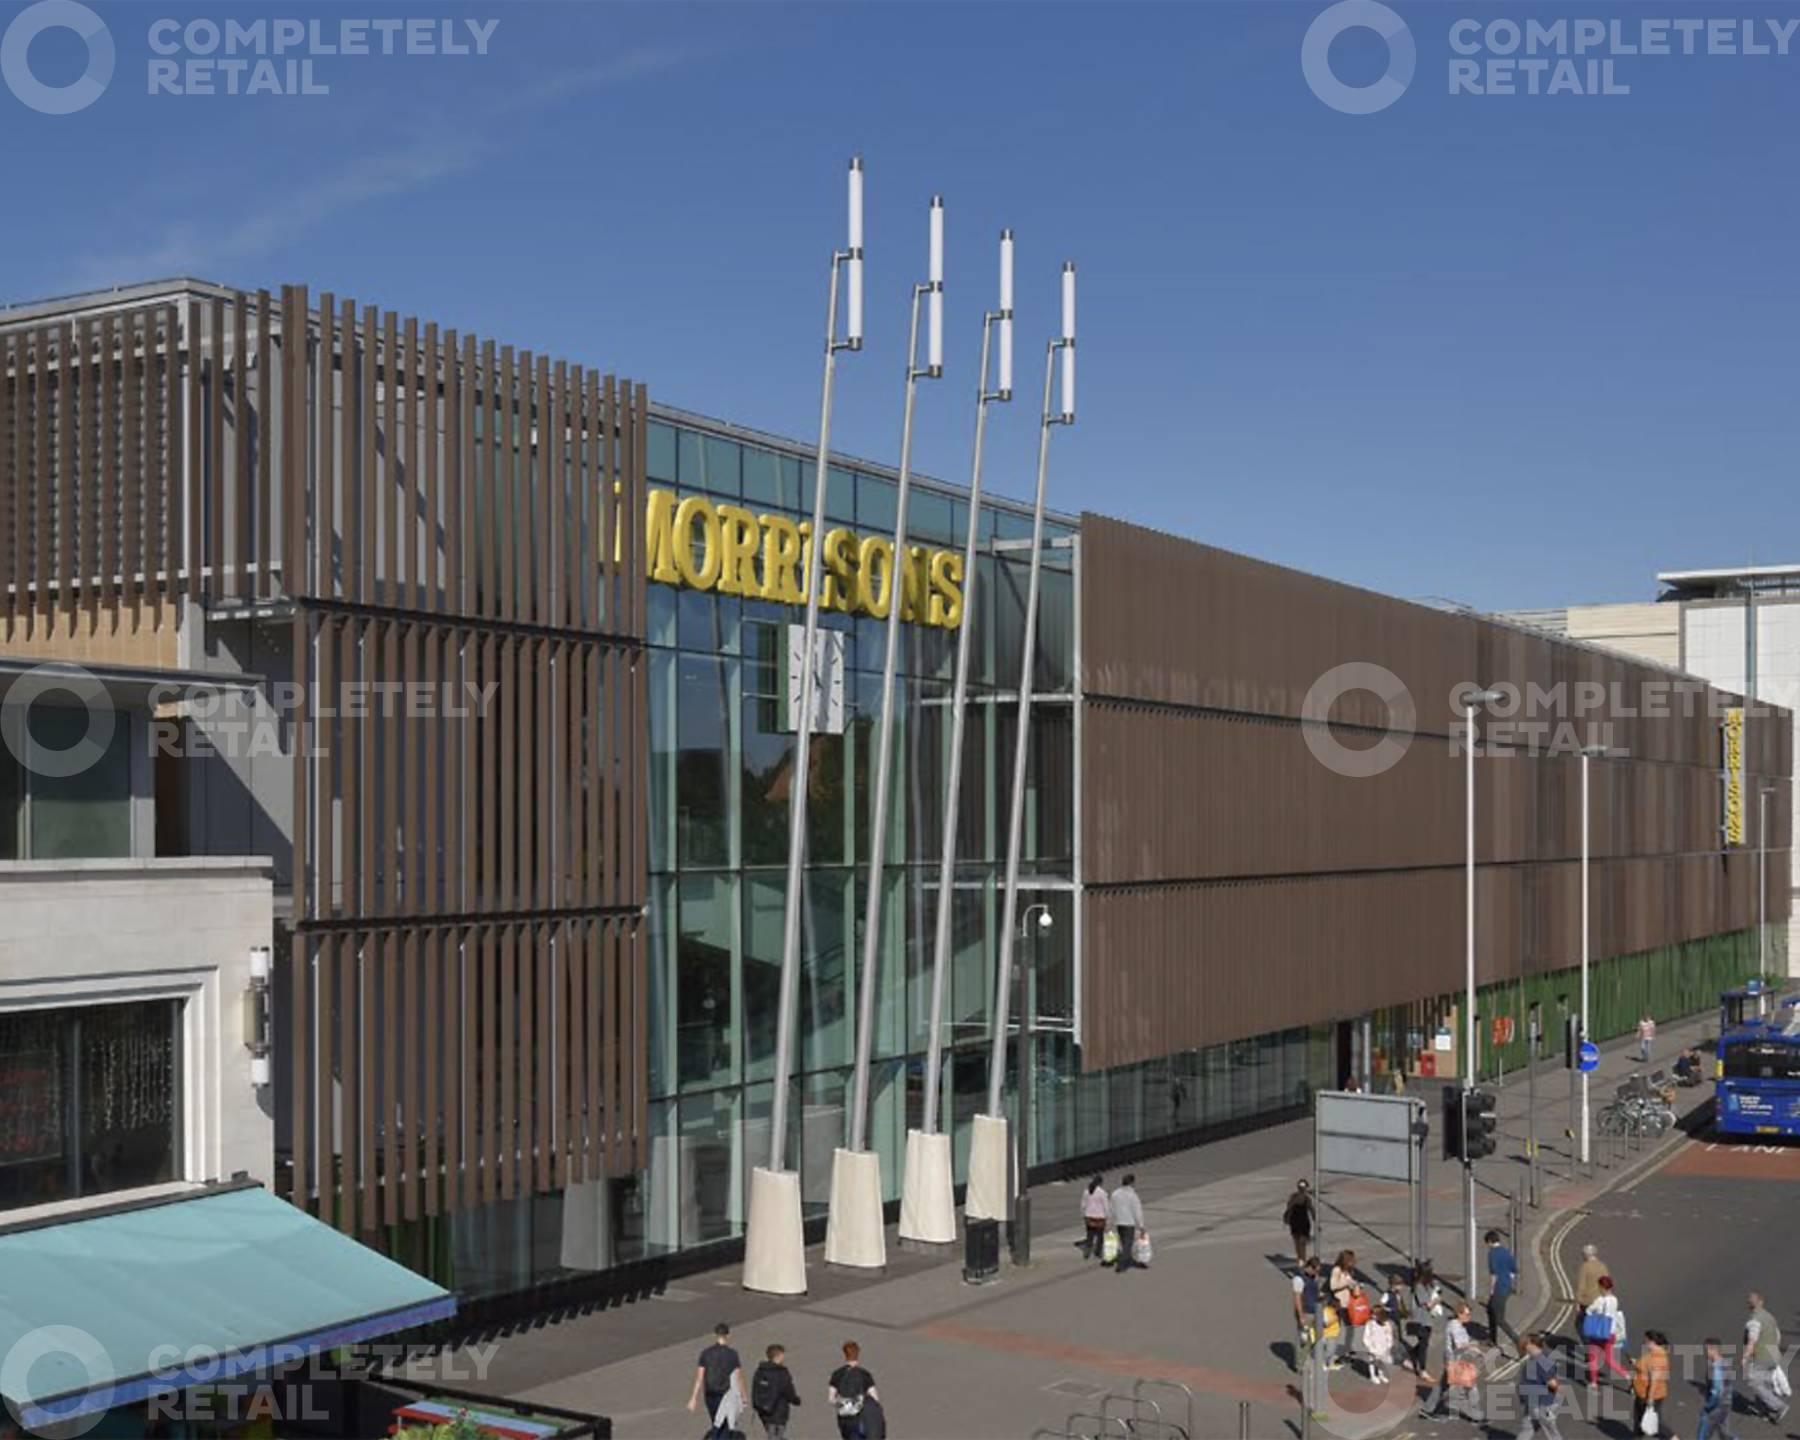 WM Morrison Supermarket - Crawley